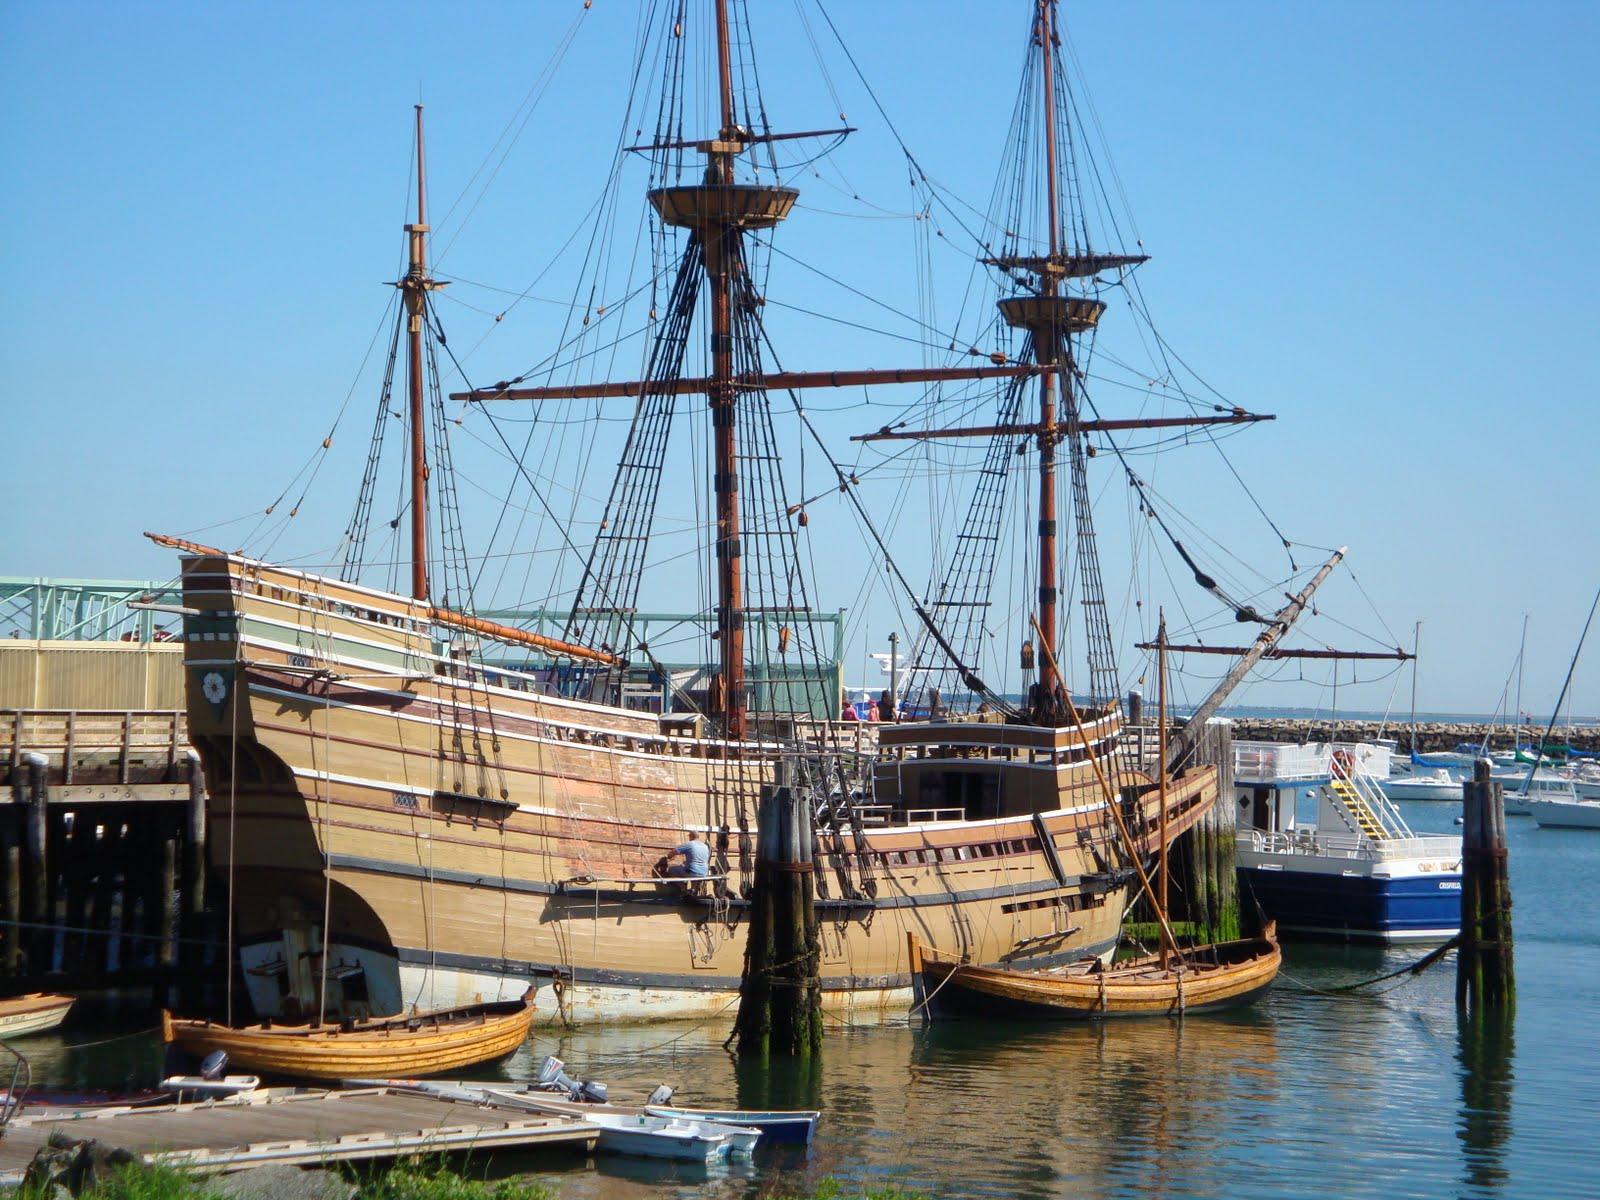 Mayflower Ship Mayflower - the ship the